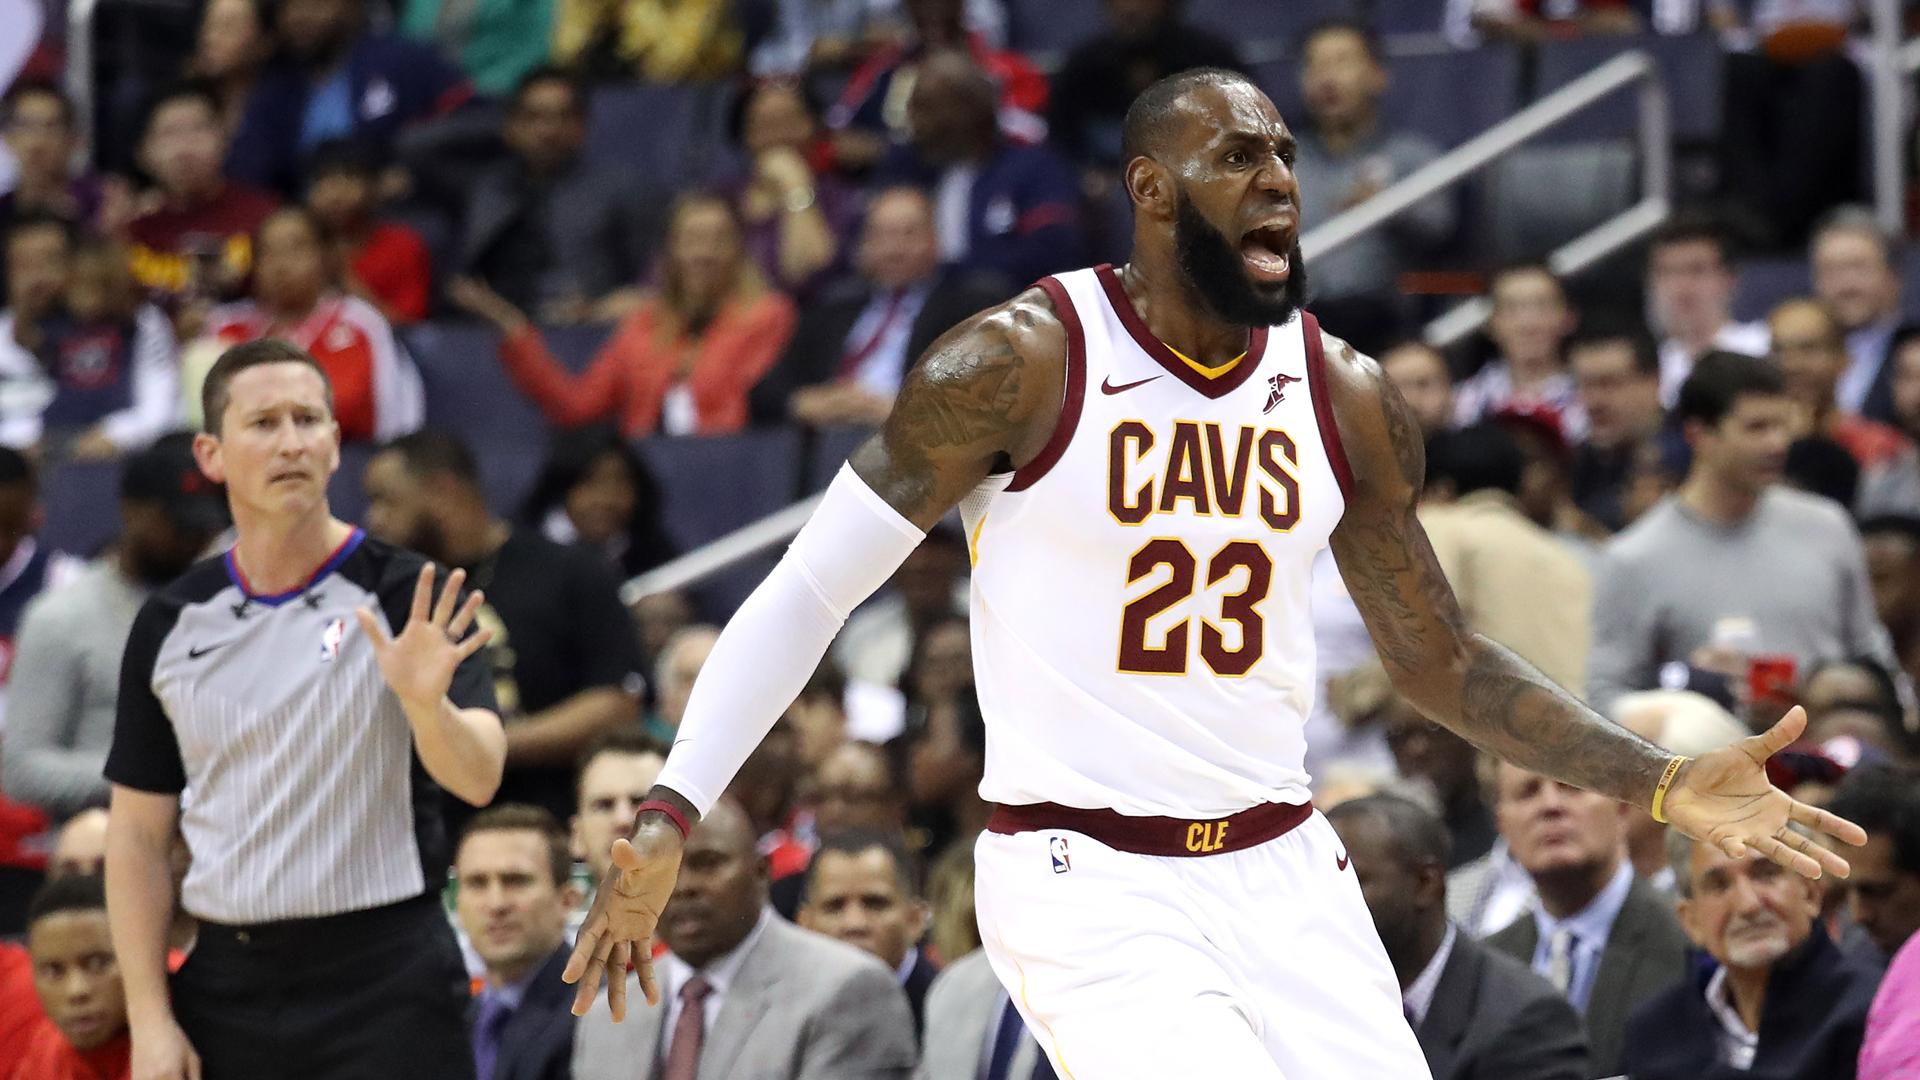 NBA wrap: LeBron James rips own team as Raptors thrash Cavs